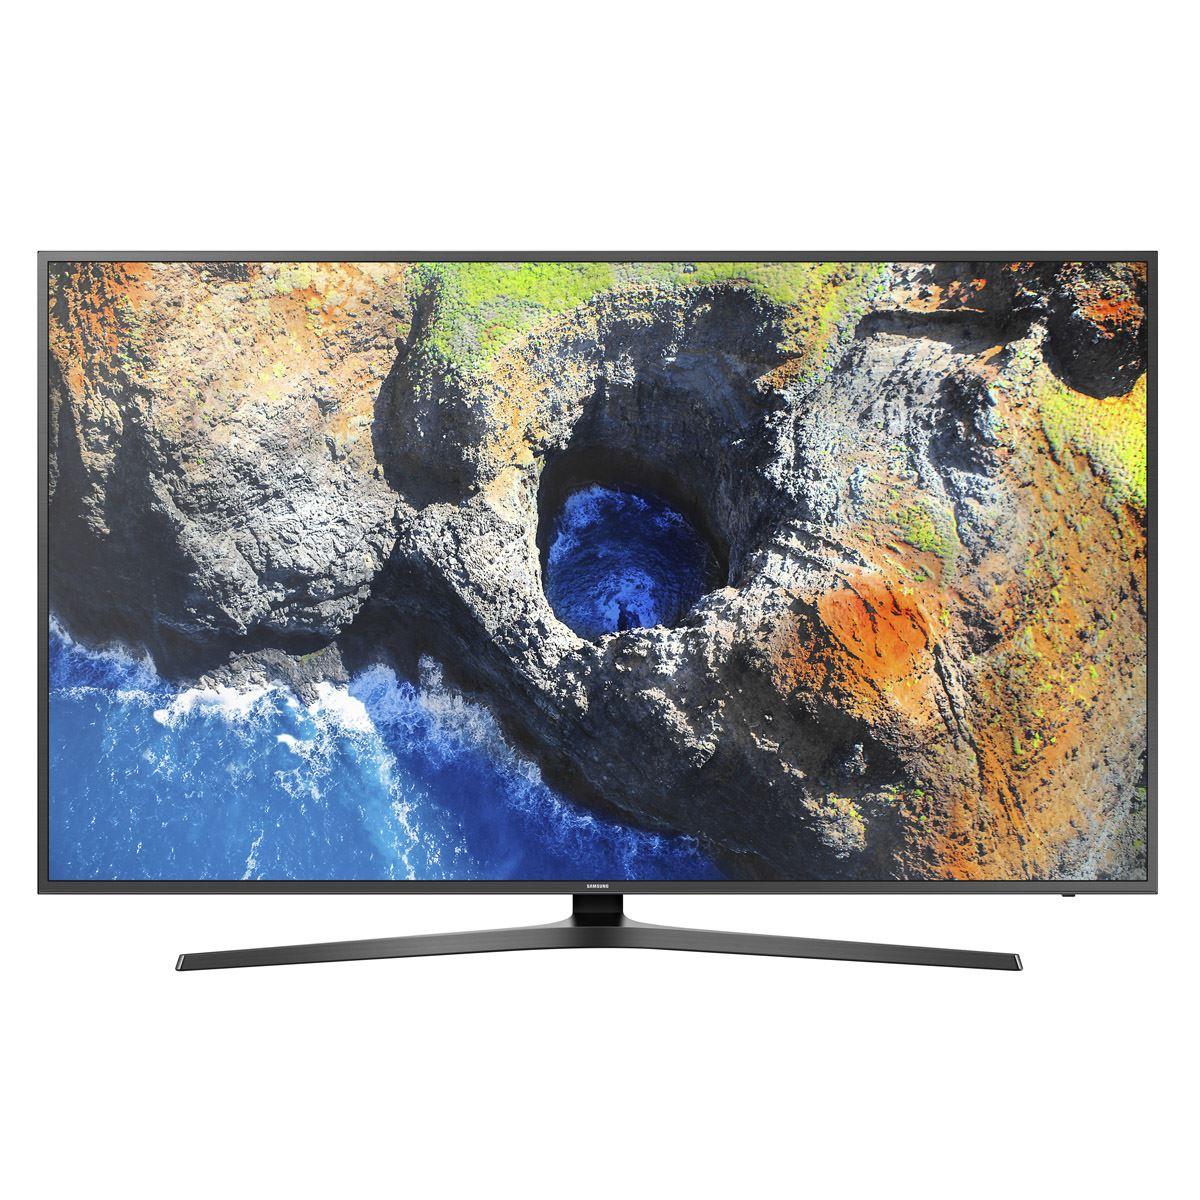 "Sanborns: Pantalla Samsung 49"" Smart TV Ultra HD 4K Plana (Precio con Banorte)"